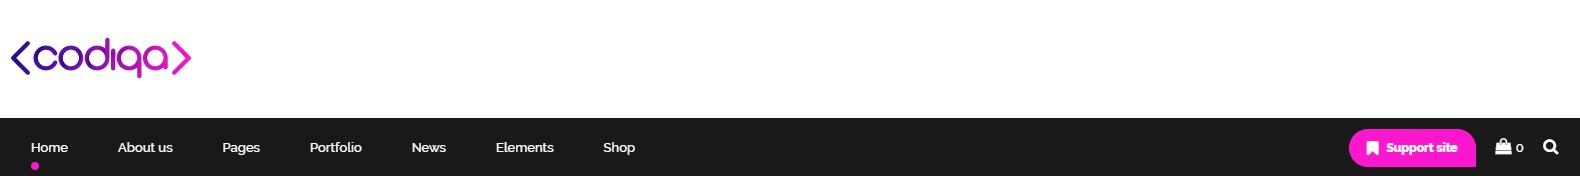 https://documentation.bold-themes.com/codiqa/wp-content/uploads/sites/49/2019/10/header-light-dark.jpg